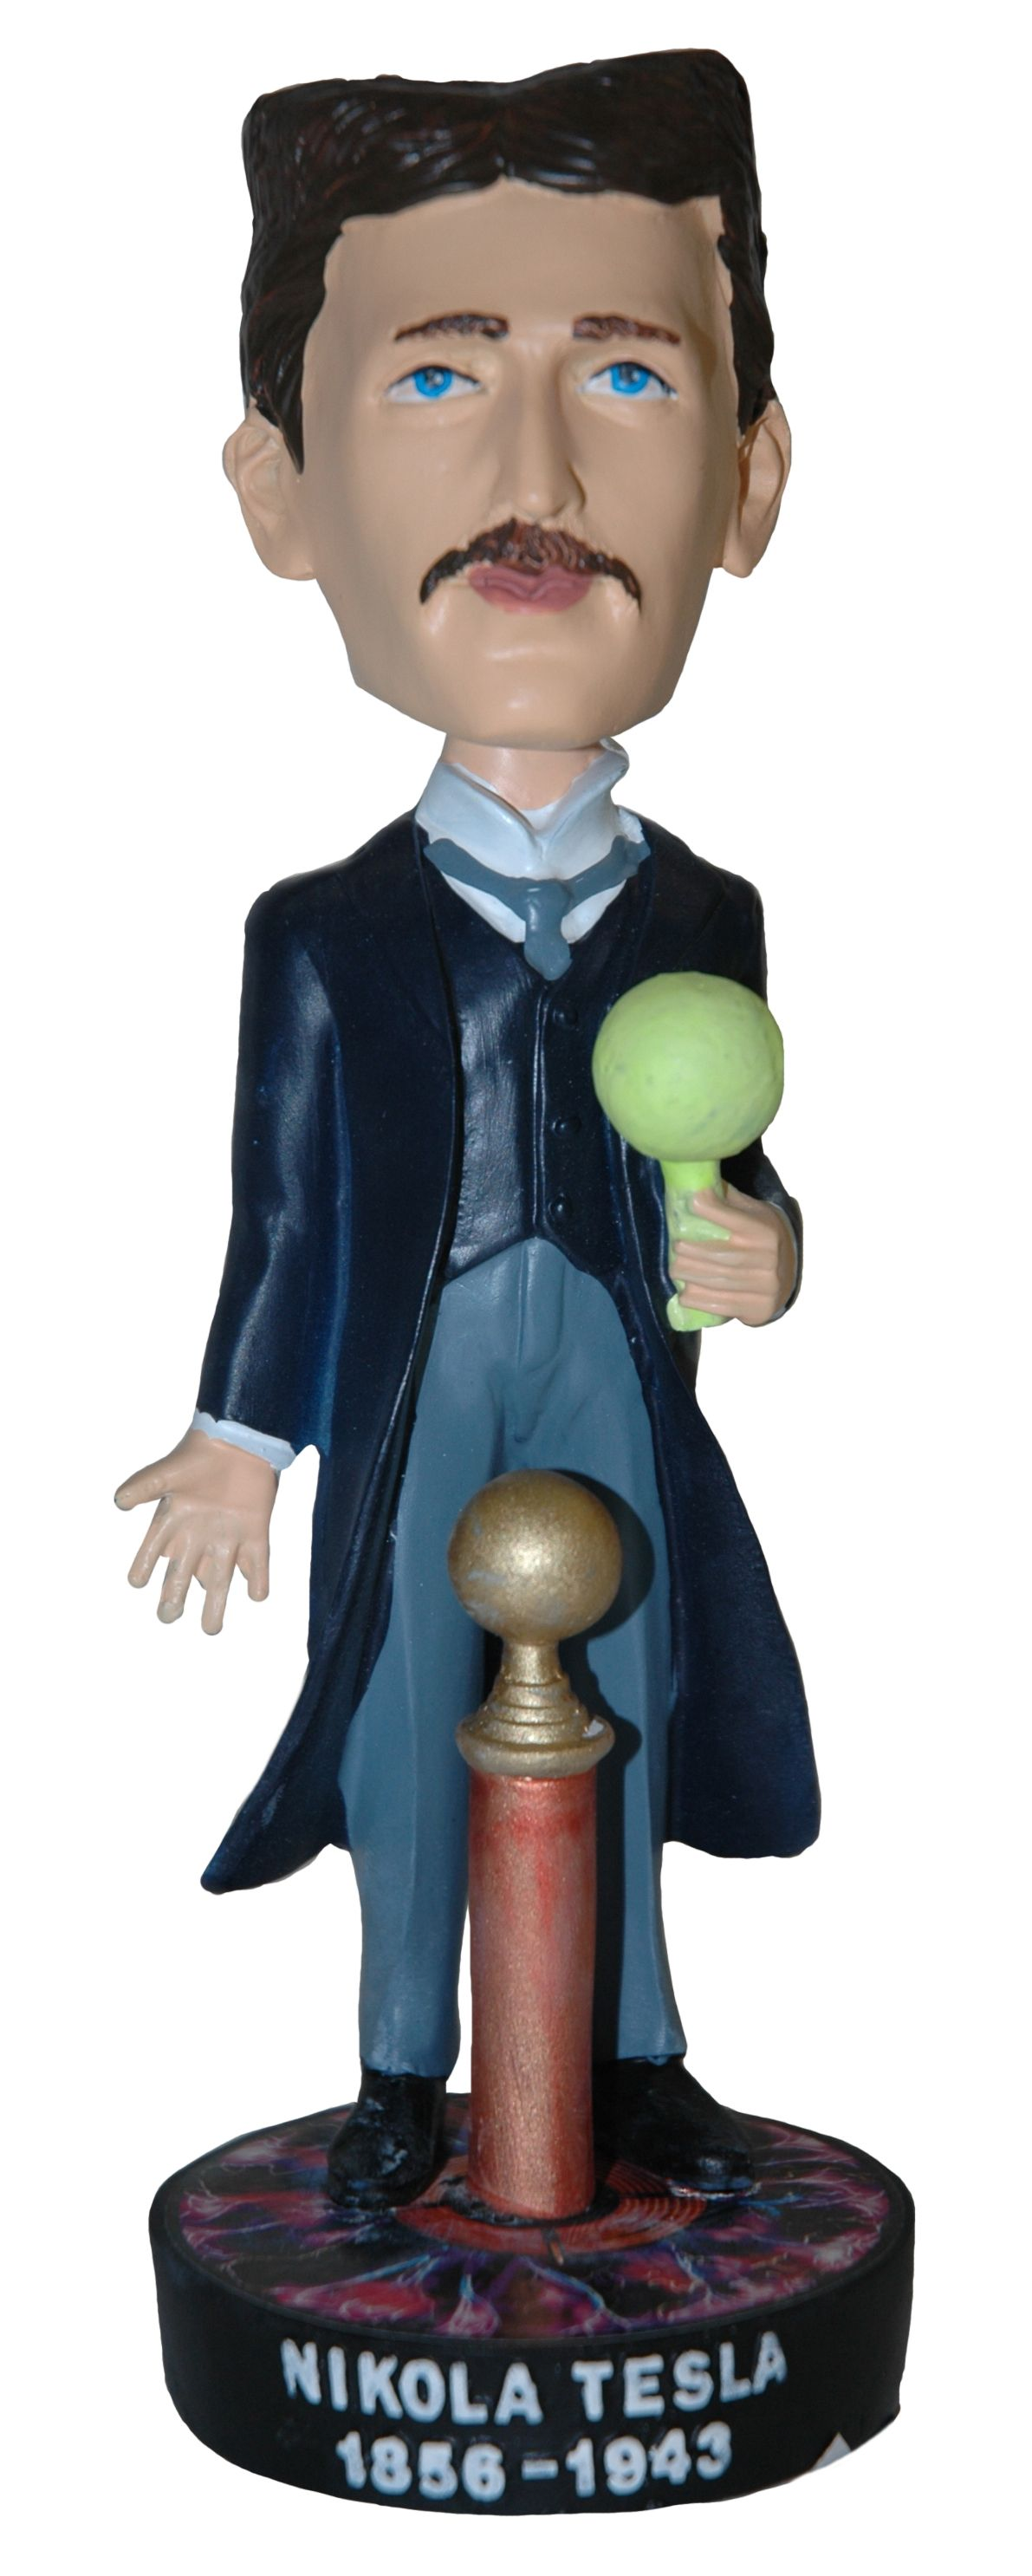 Nikola Tesla Collector Bobblehead